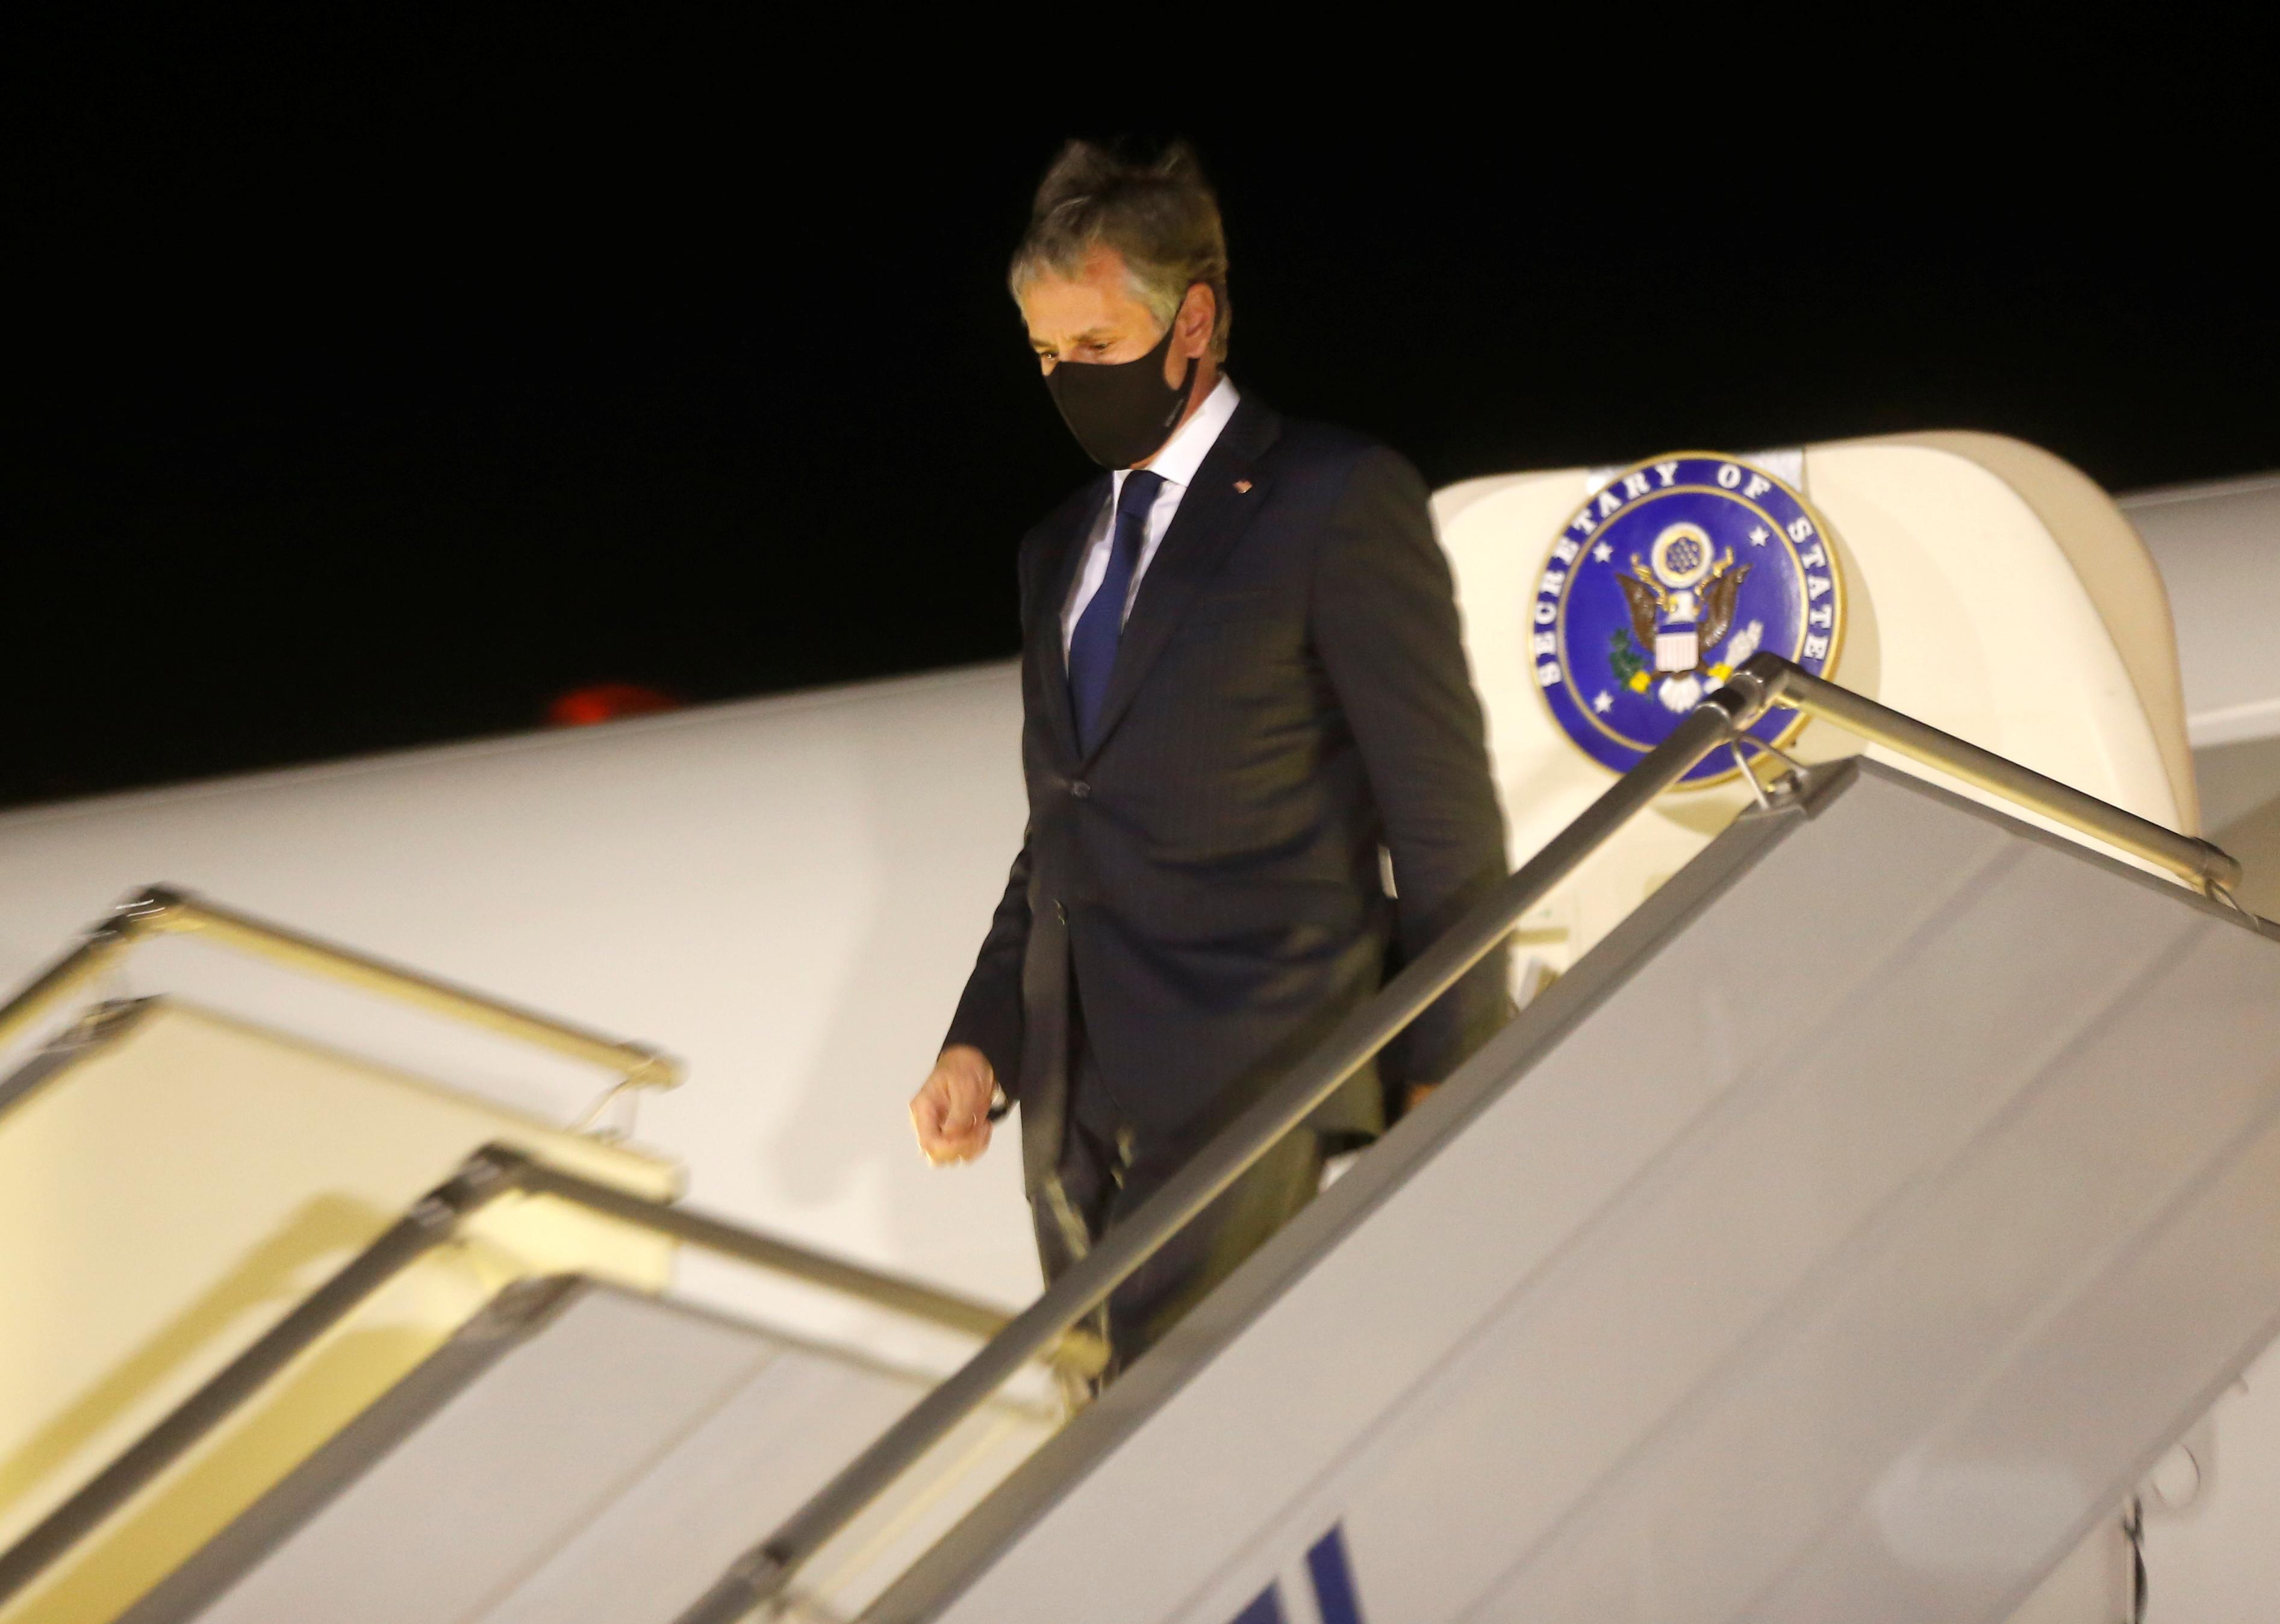 U.S. Secretary of State Antony Blinken disembarks after landing at Boryspil International airport outside Kyiv, Ukraine May 6, 2021. Efrem Lukatsky/Pool via REUTERS